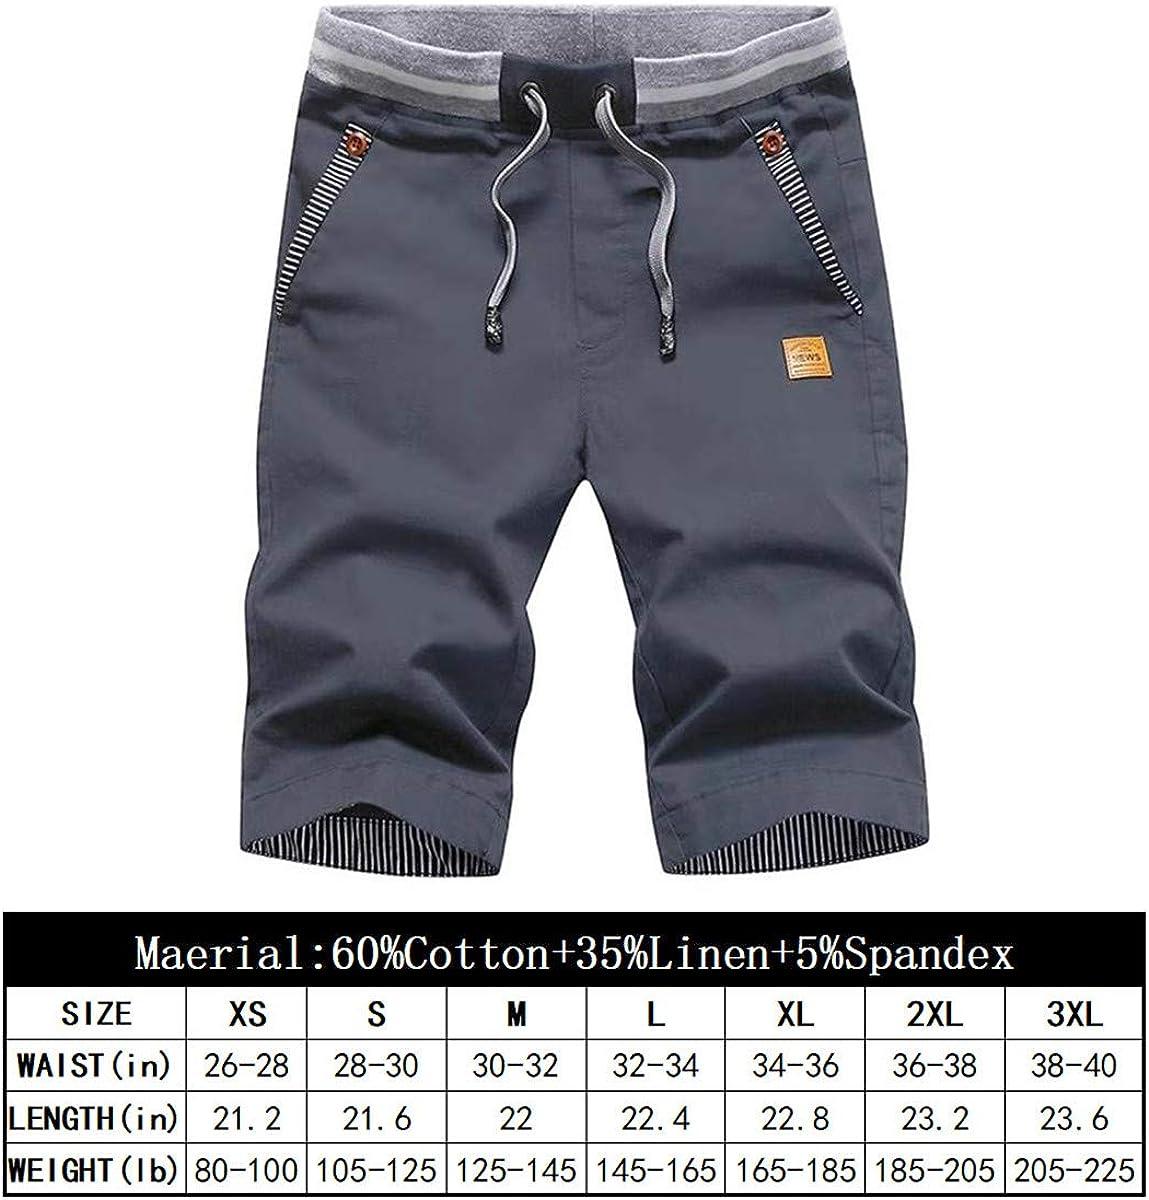 Tansozer Mens Shorts Casual Classic Fit Drawstring Summer Beach Shorts with Elastic Waist and Pockets